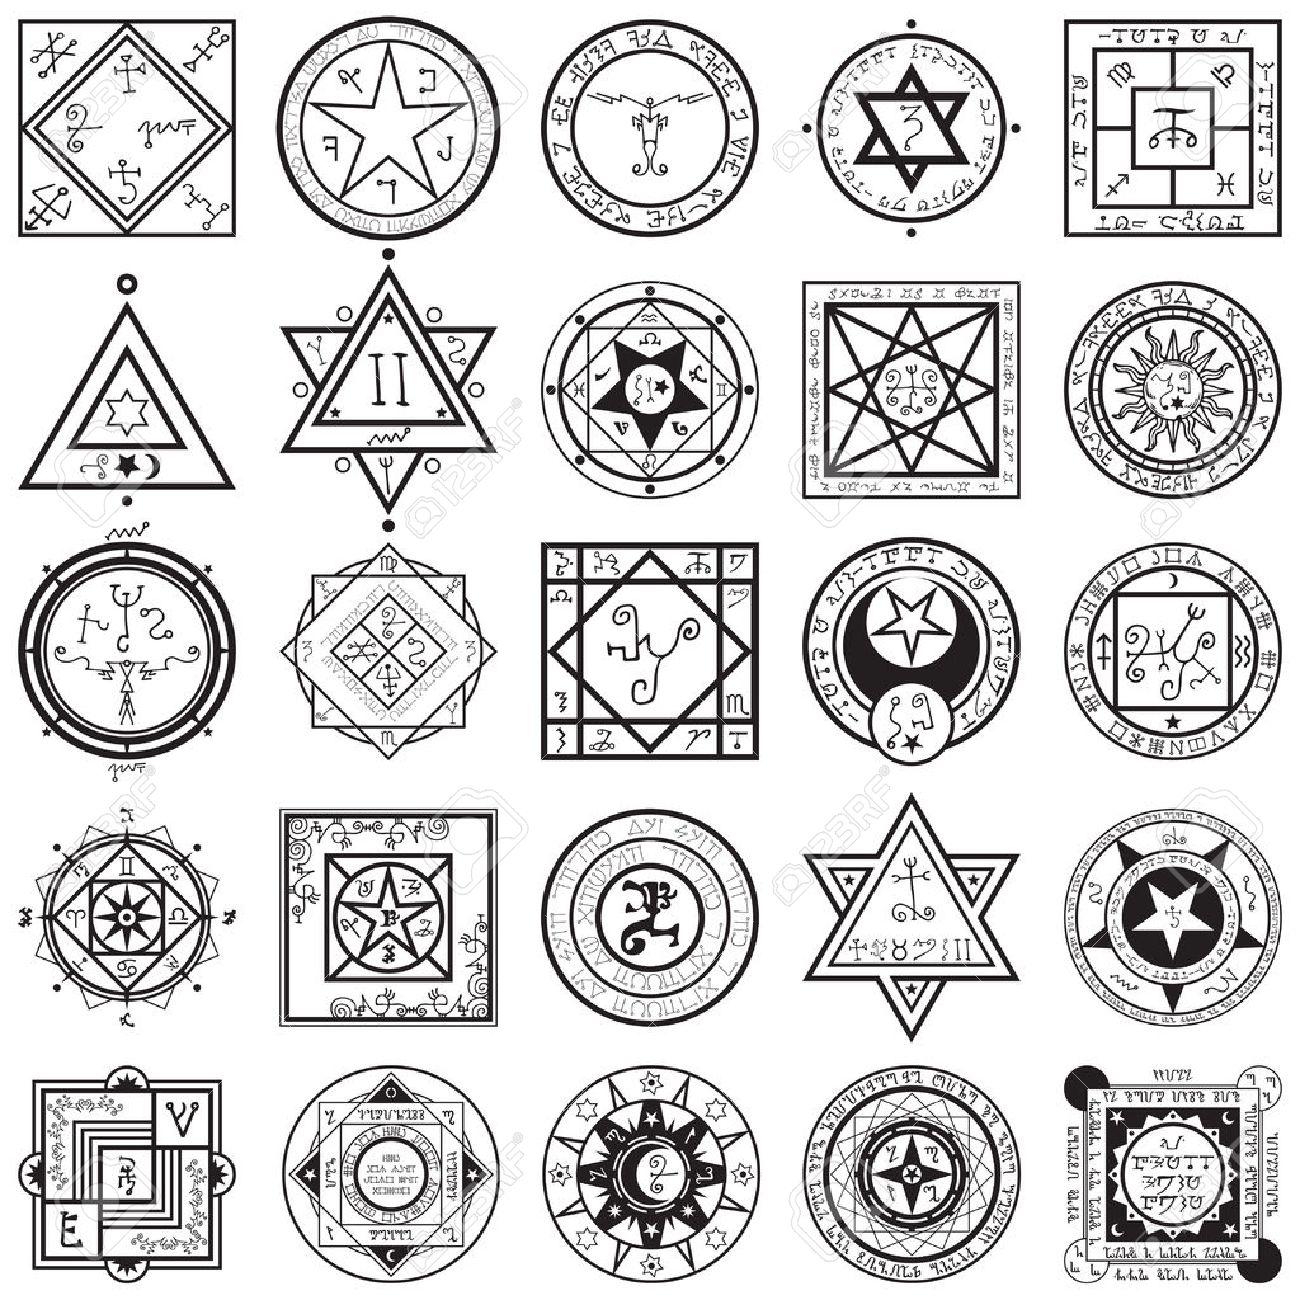 A vectors collection set of 25 unique magic and alchemy sigils and seals illustrations. - 39340090